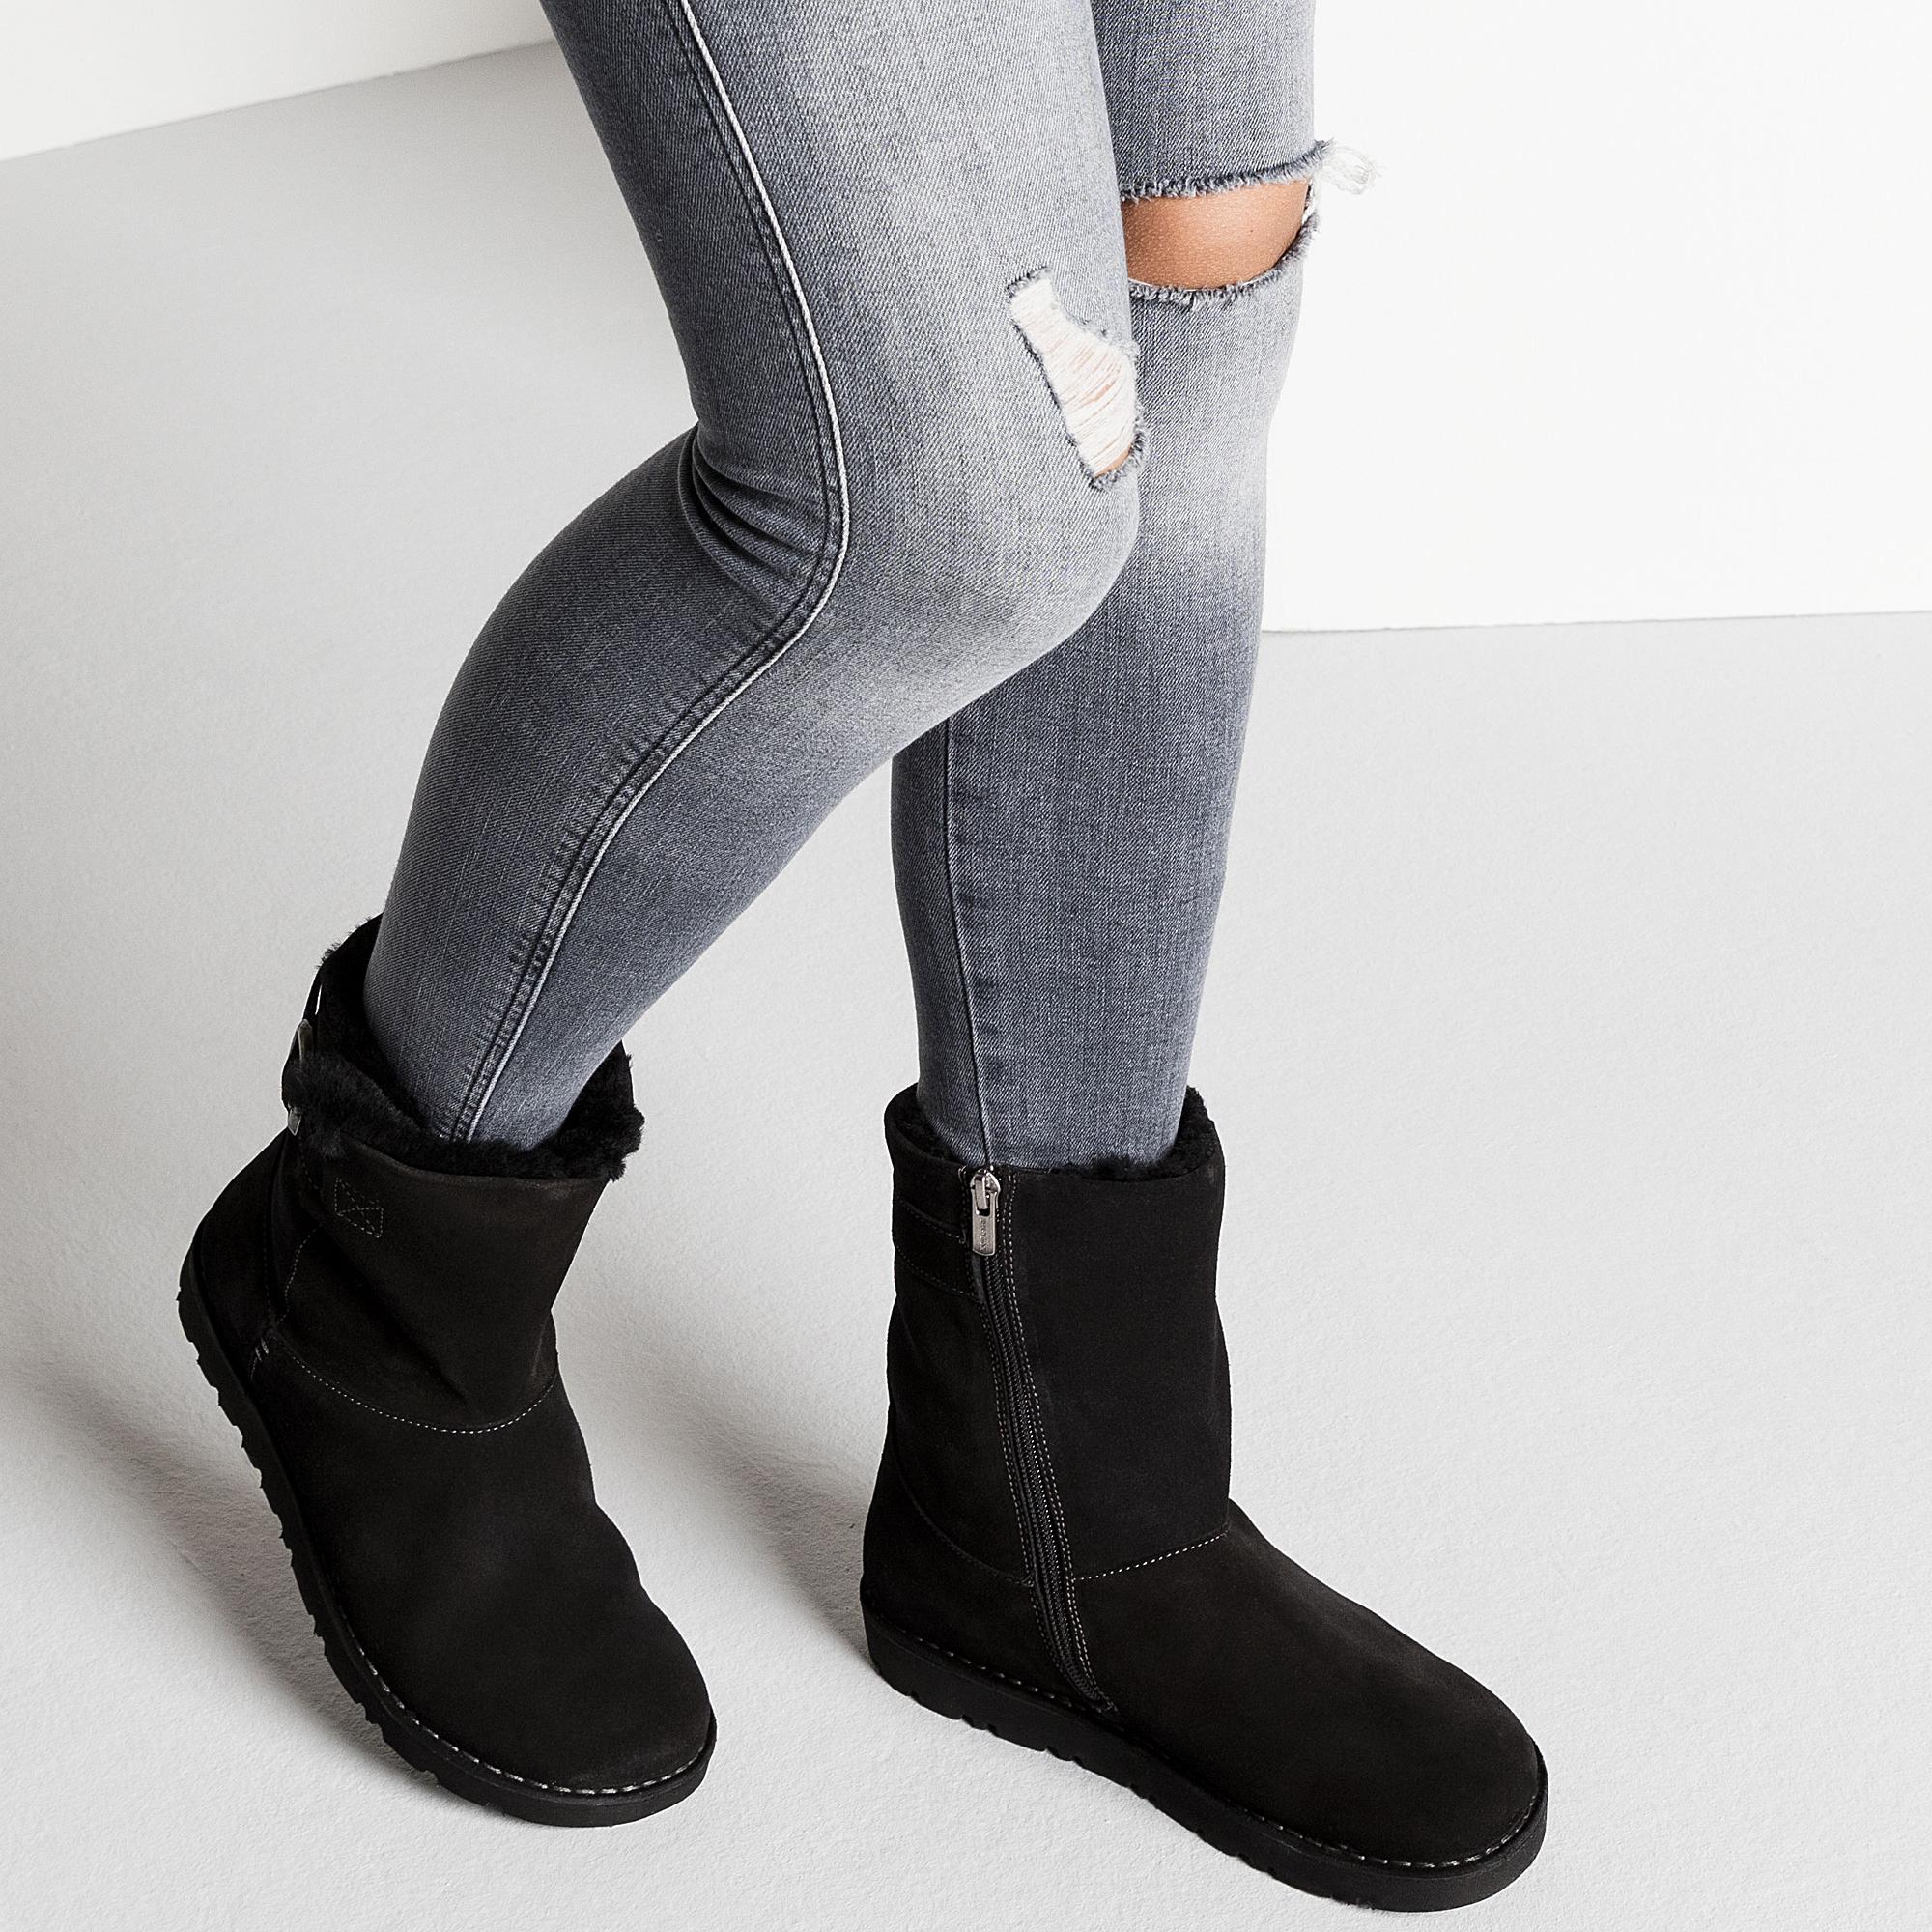 Westford Suede Leather Black